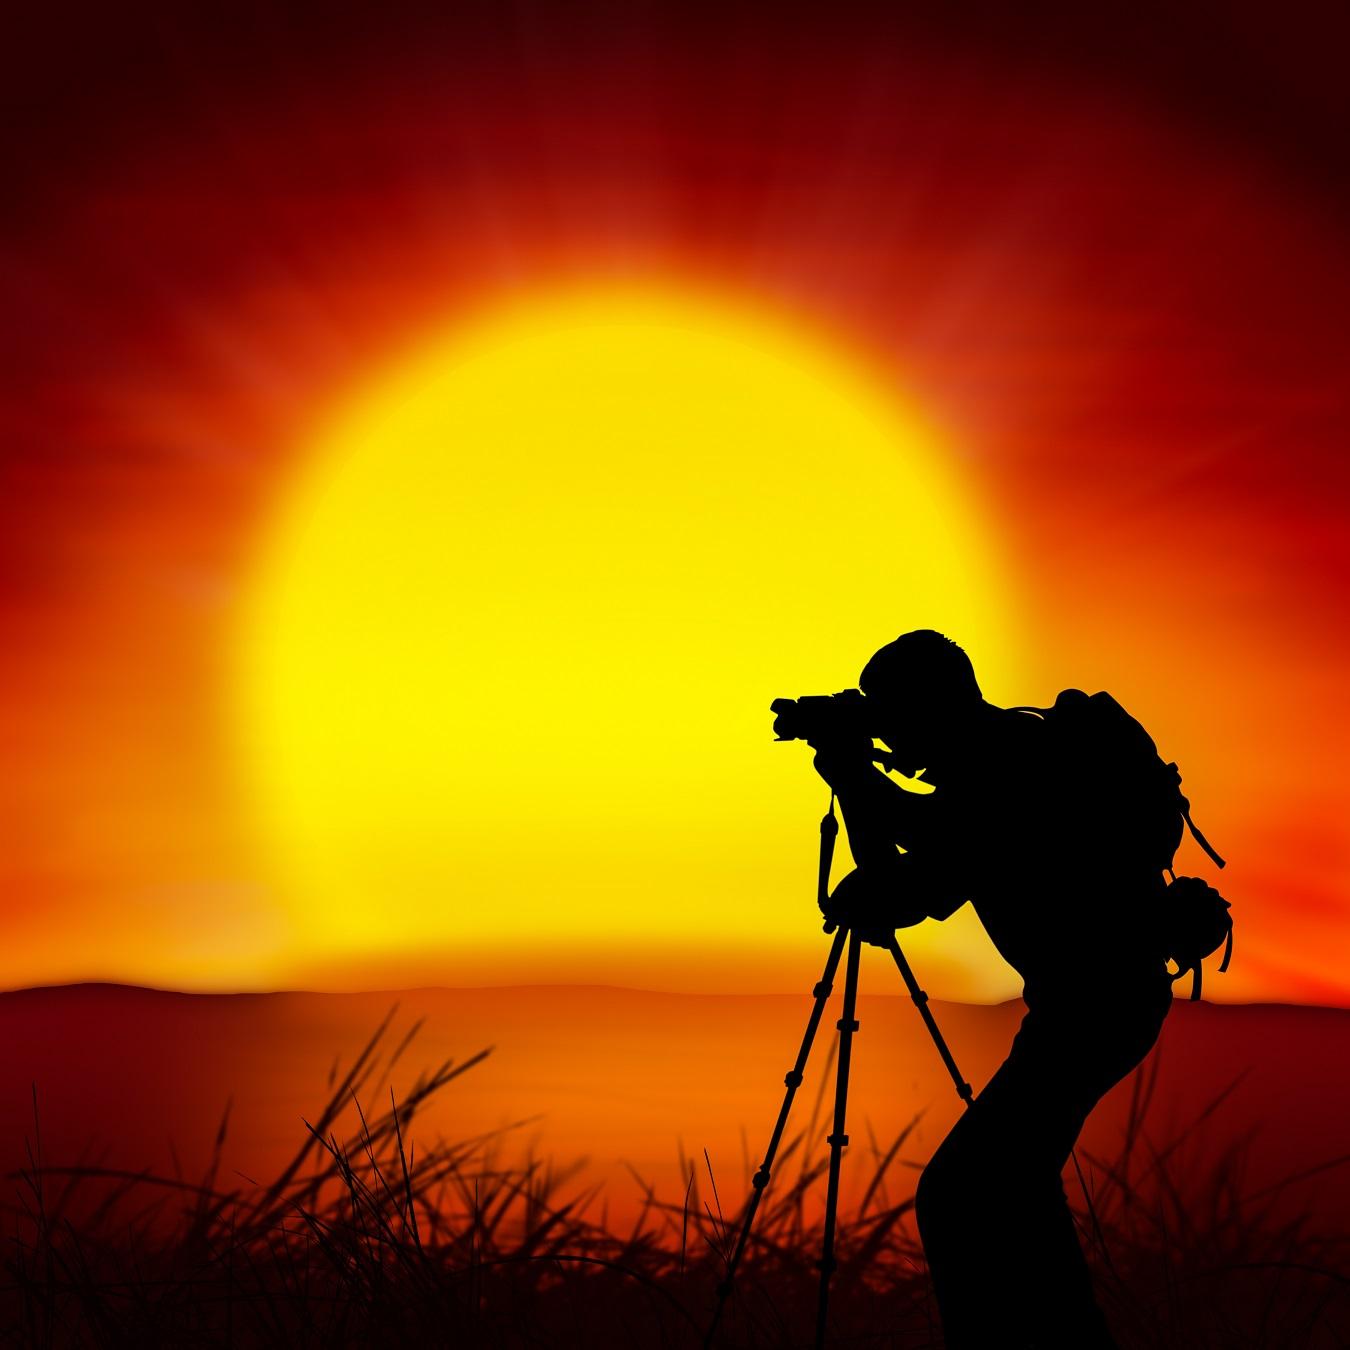 hawaii sunset photographer silhouette